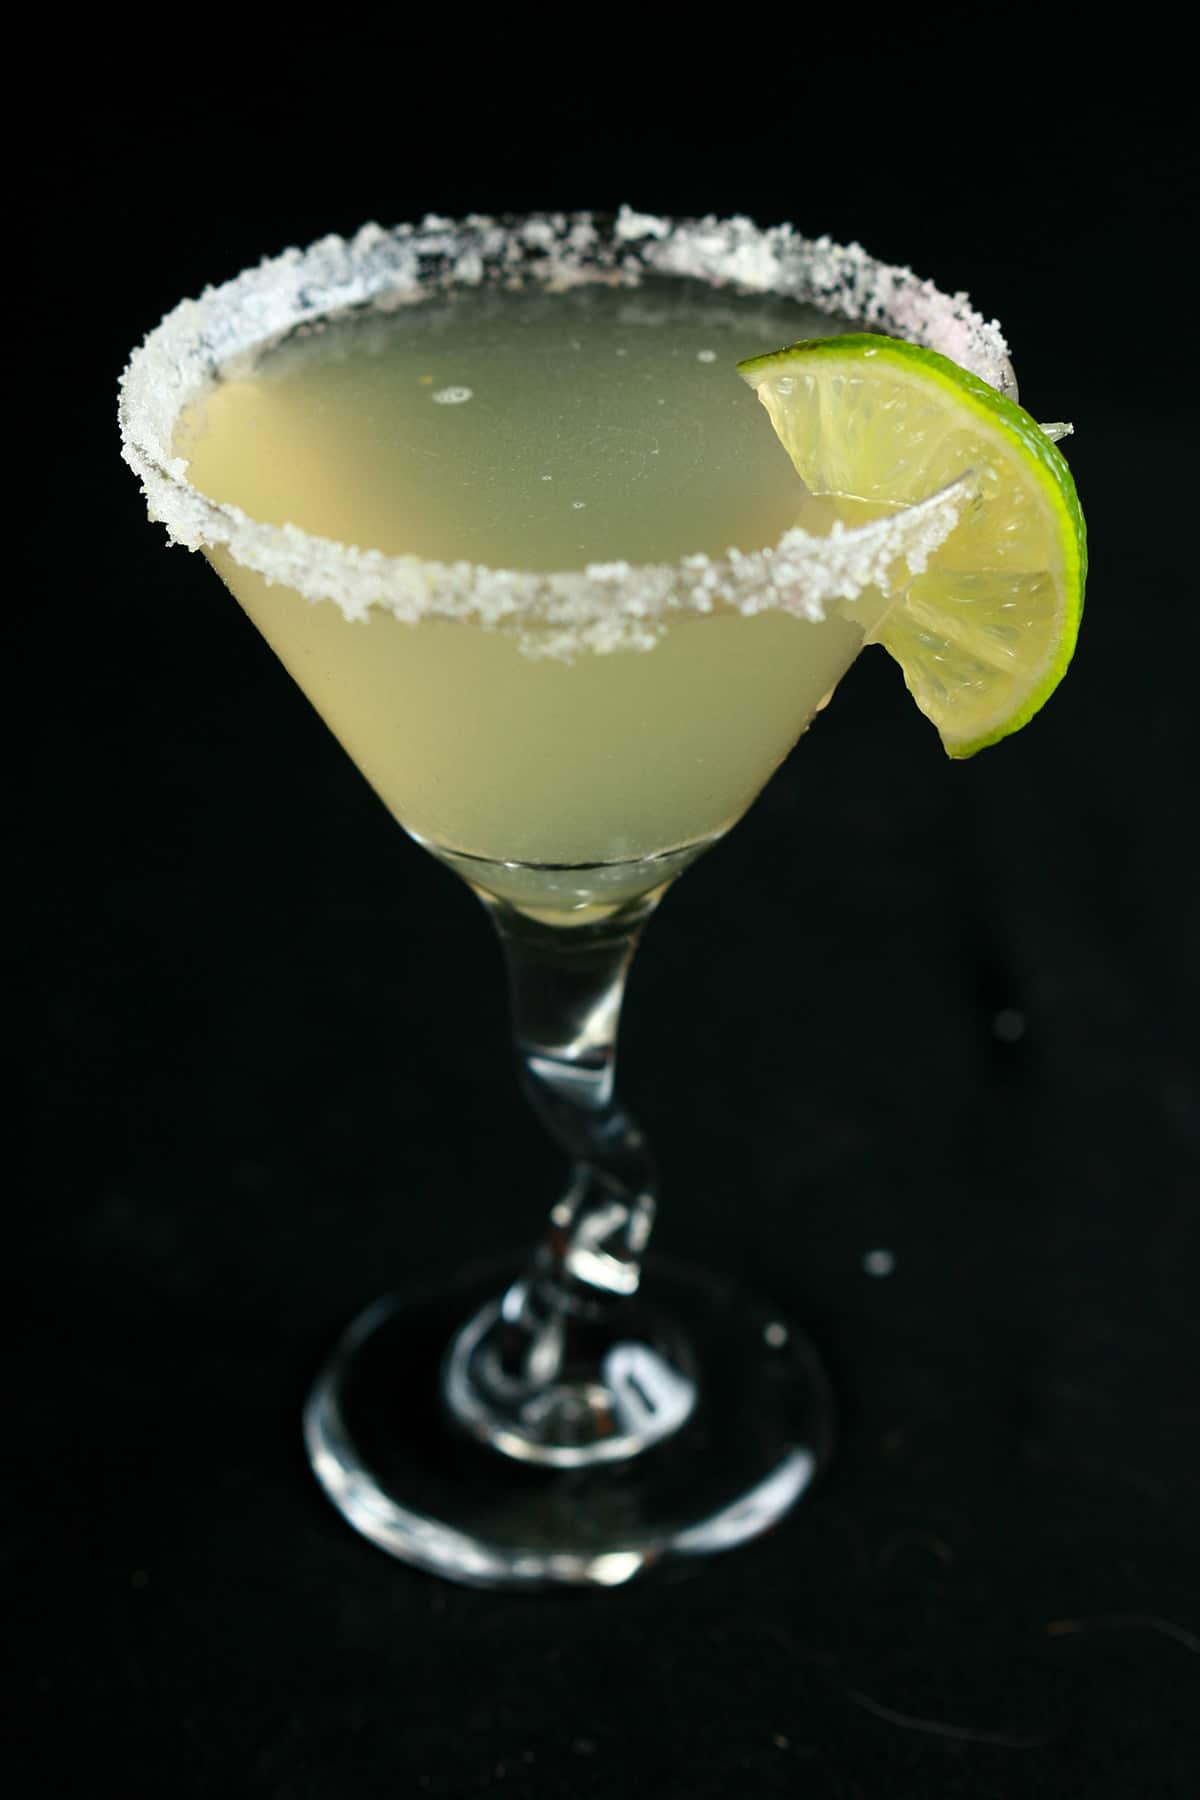 A margarita, garnished with salt rim and a lime slice.